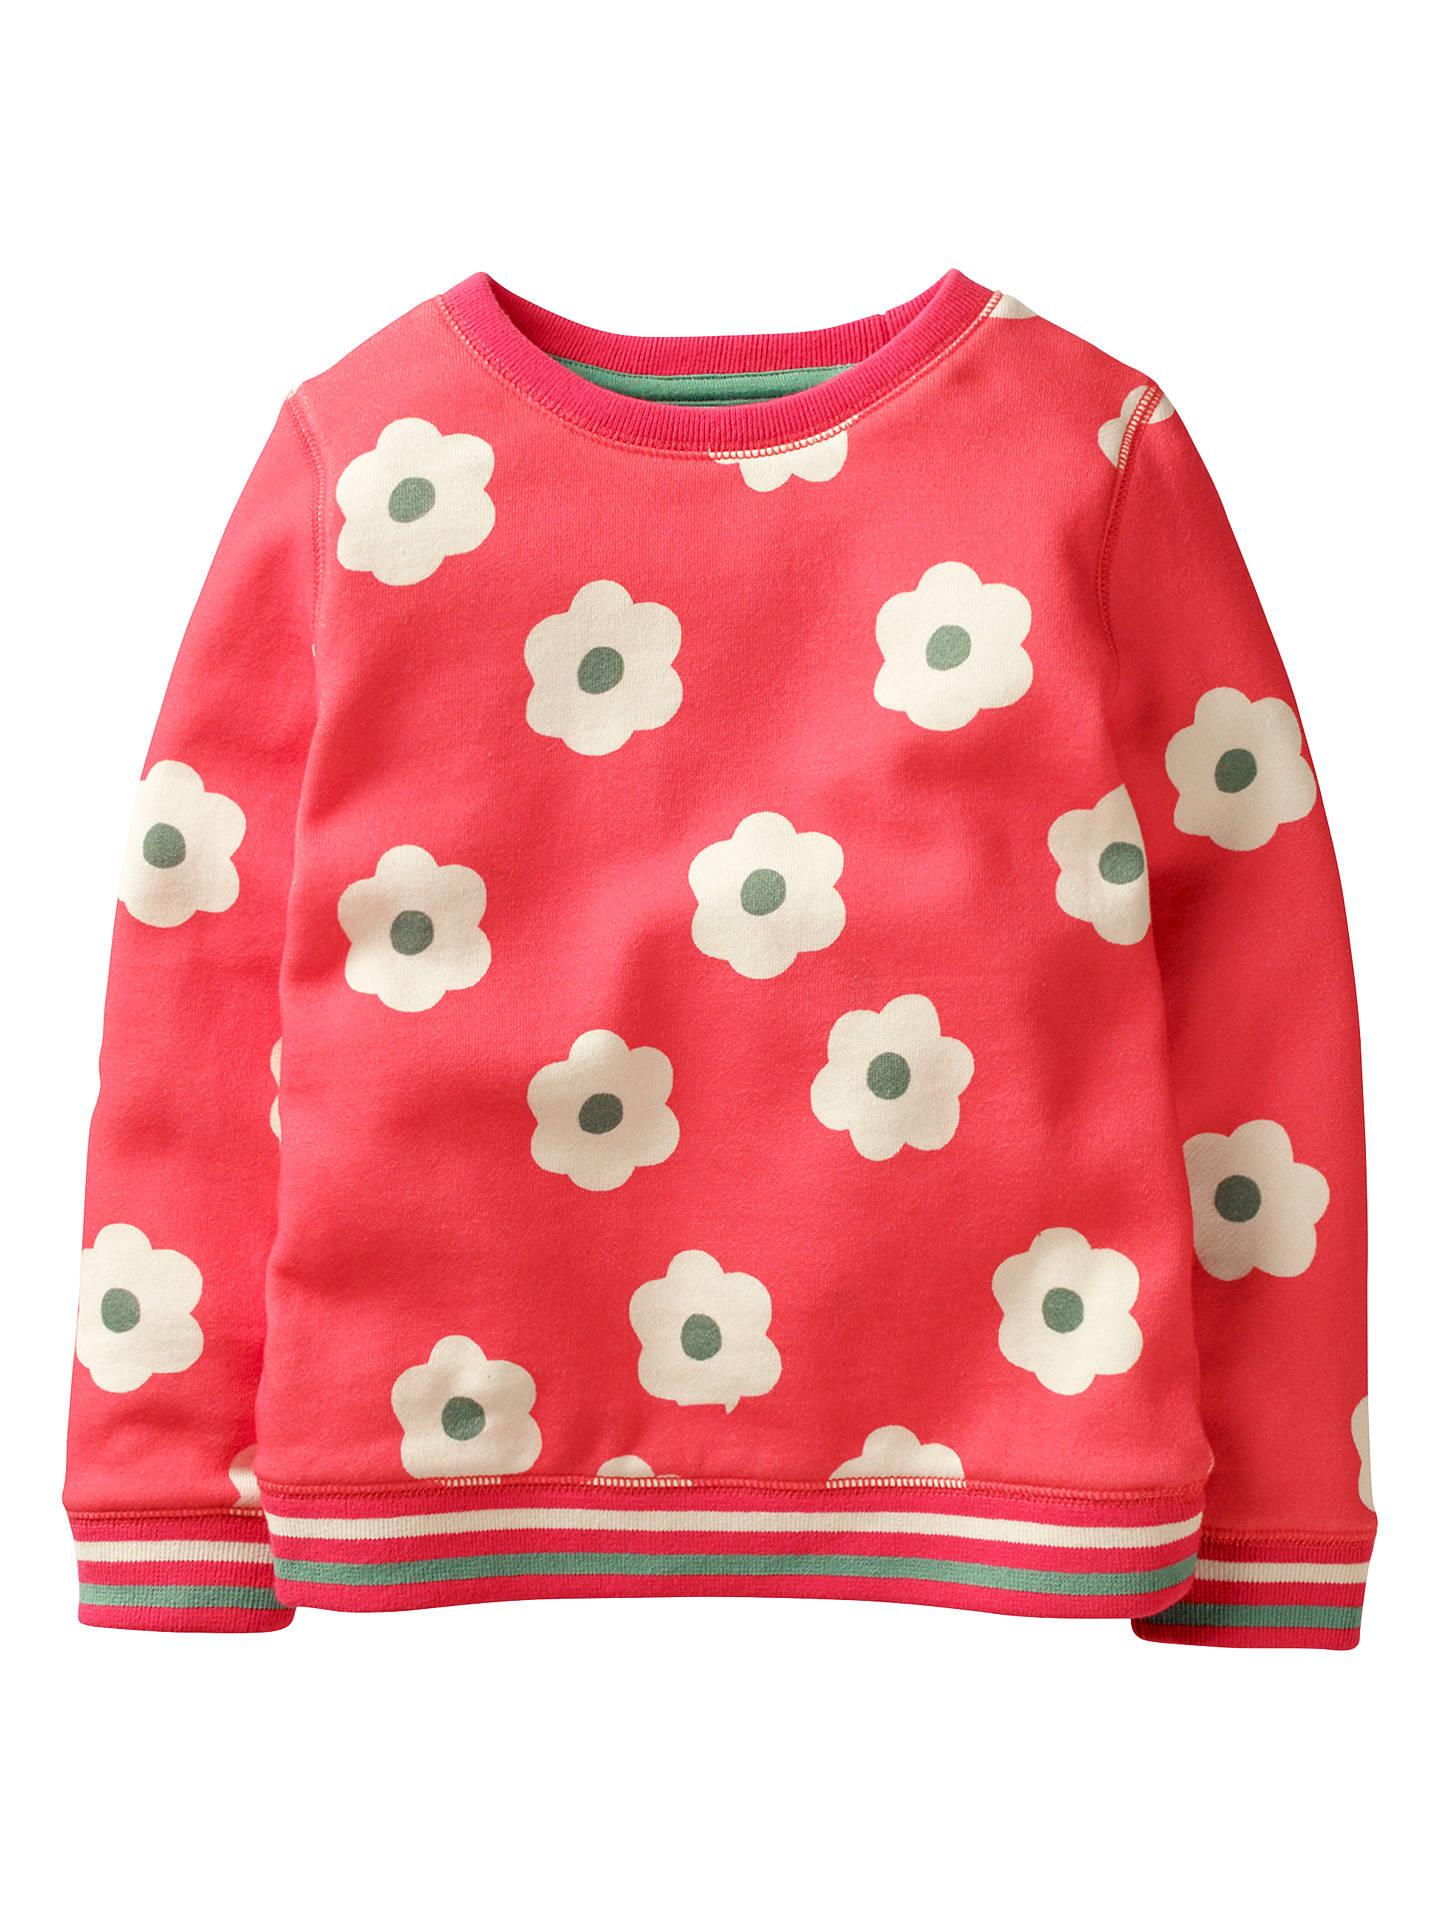 6591c0f92f09 Mini Boden Girls  Cosy Sweatshirt